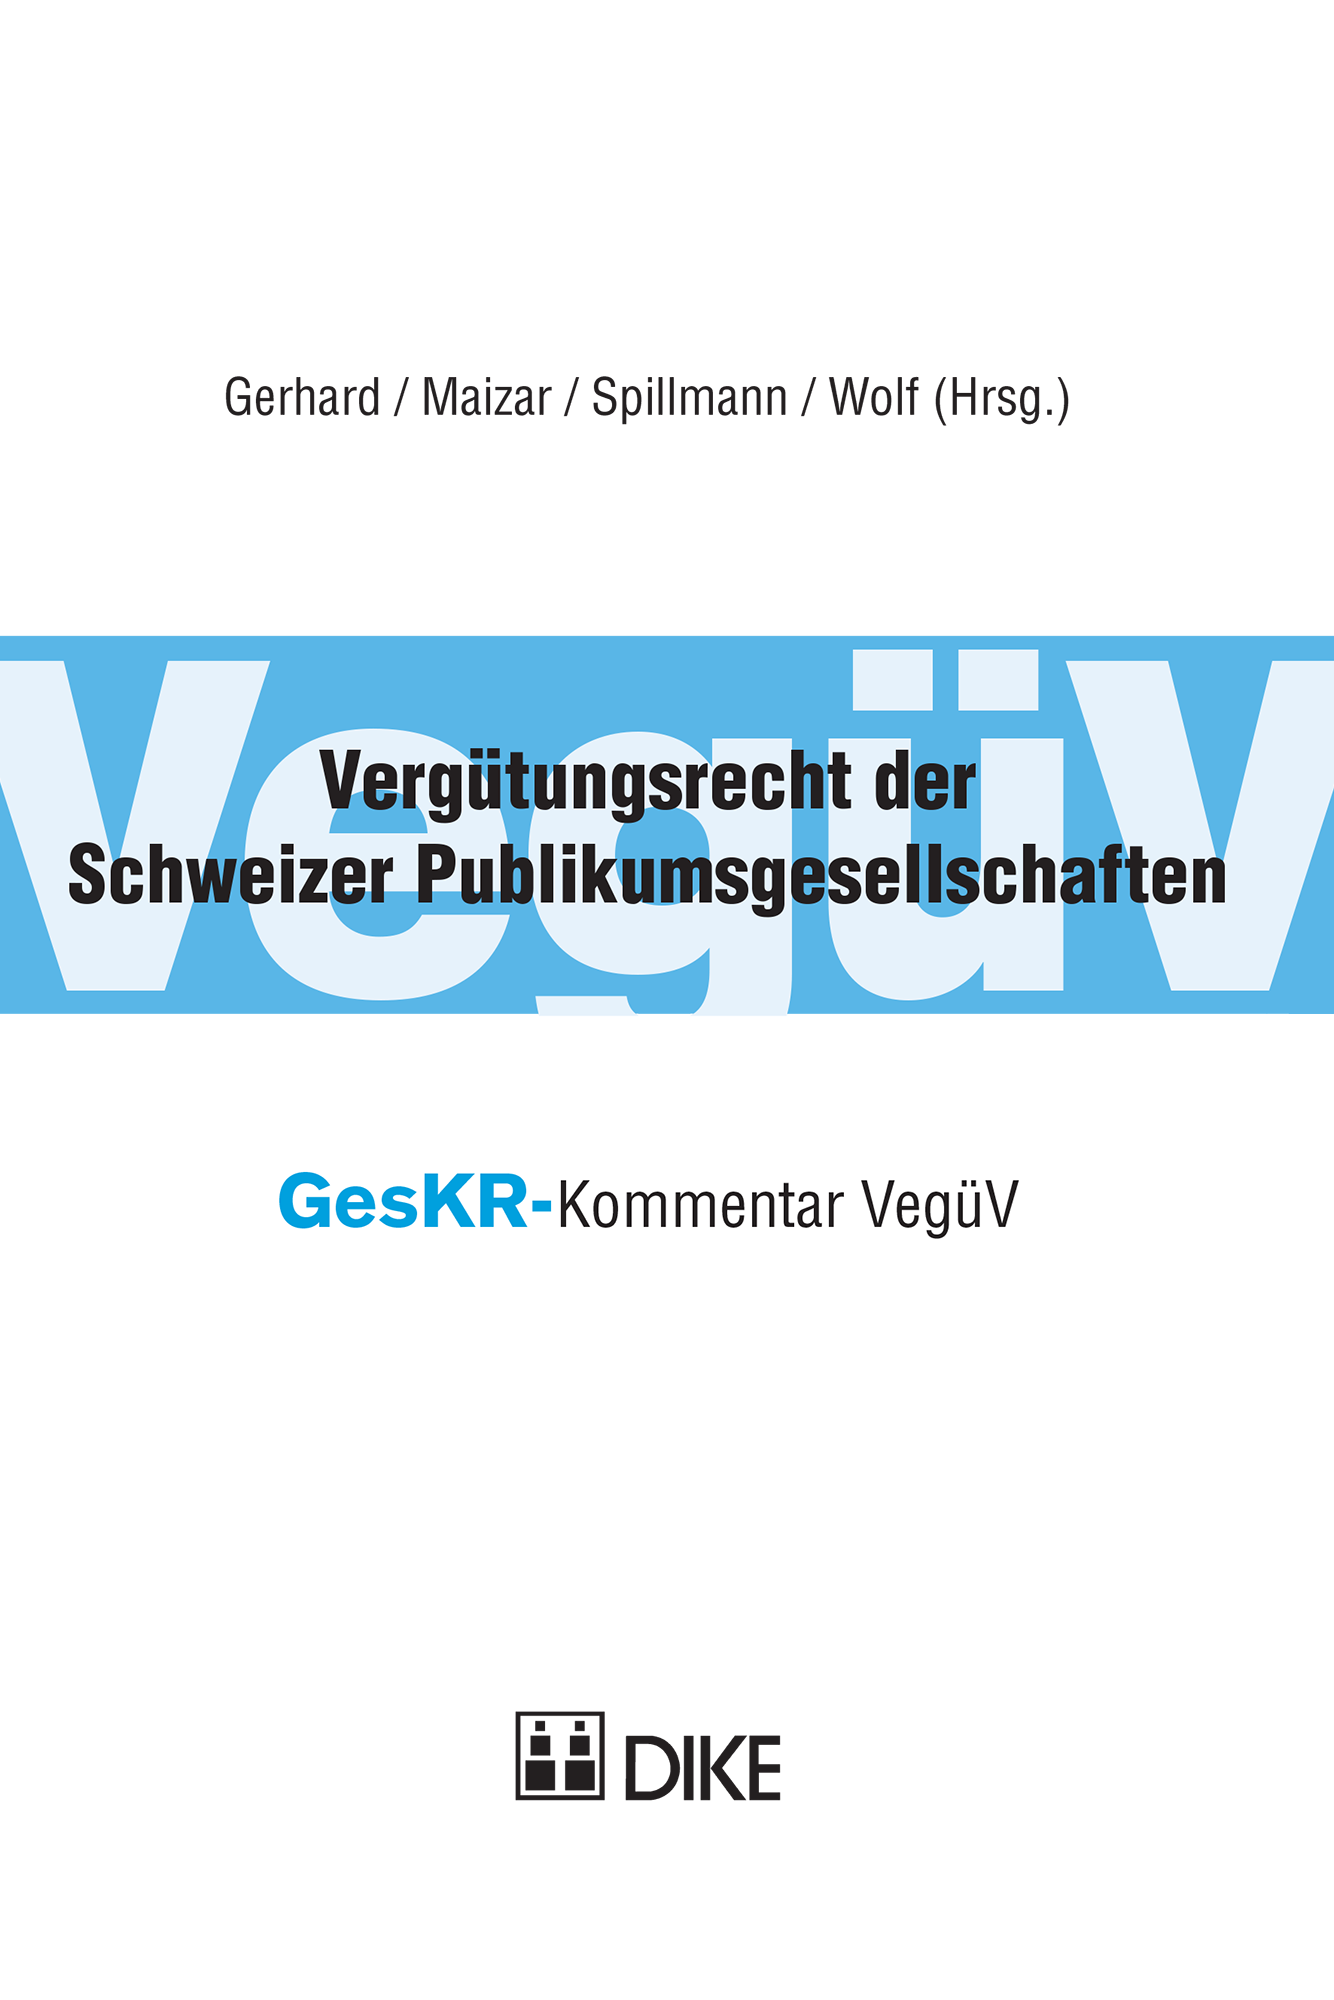 Vergütungsrecht der Schweizer Publikumsgesellschaften